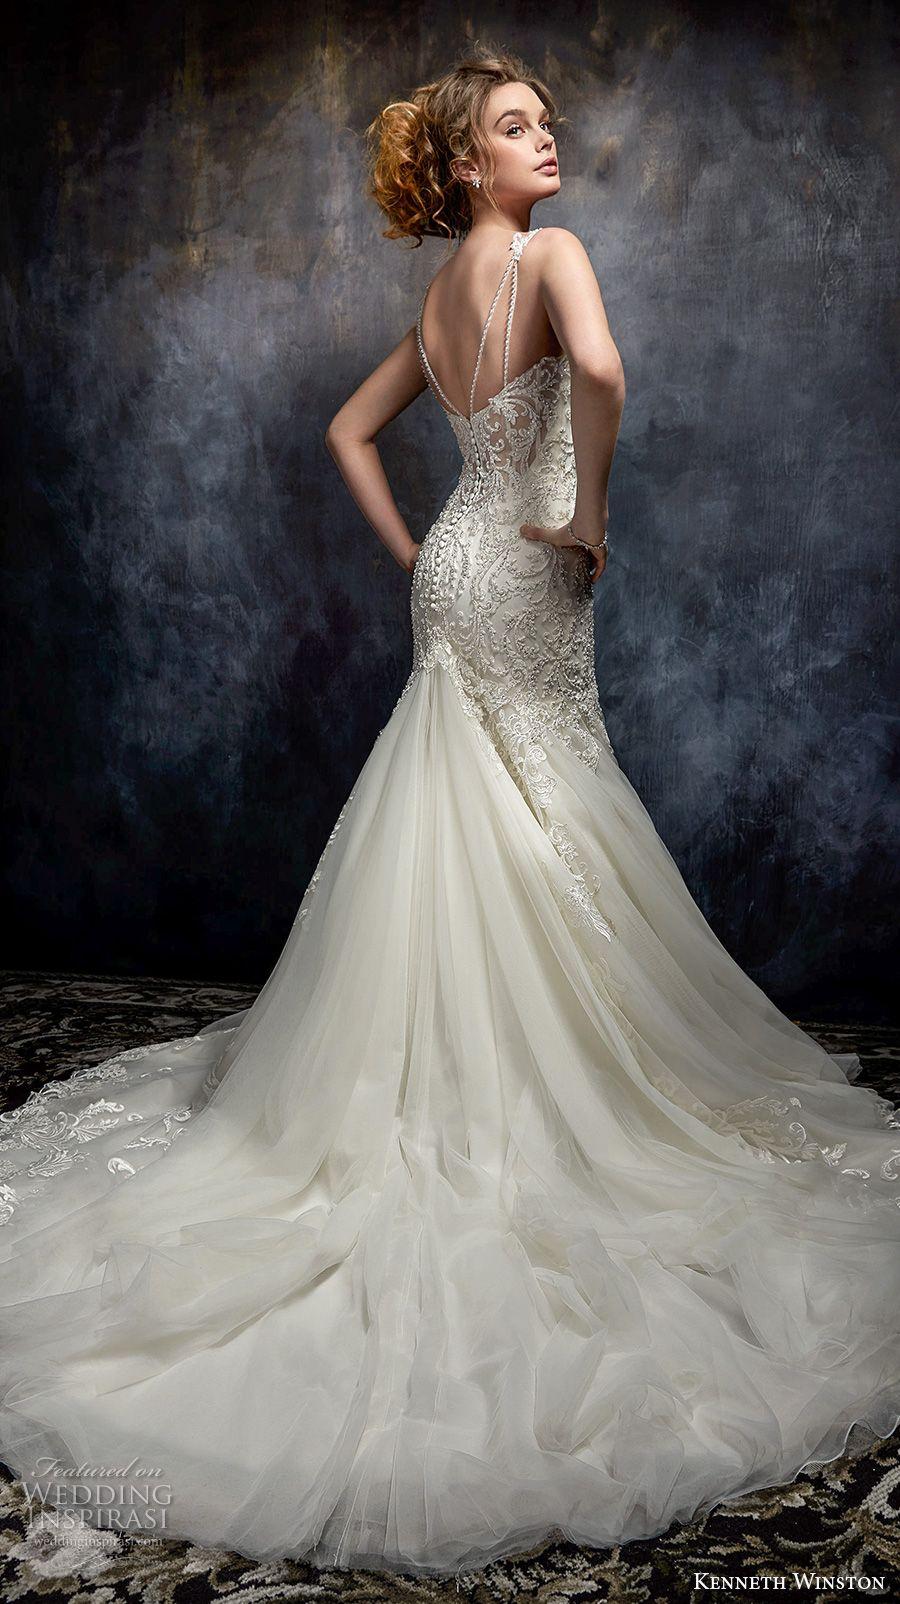 Elegant mermaid wedding dresses  Kenneth Winston Couture Wedding Dresses u Fall  Bridal